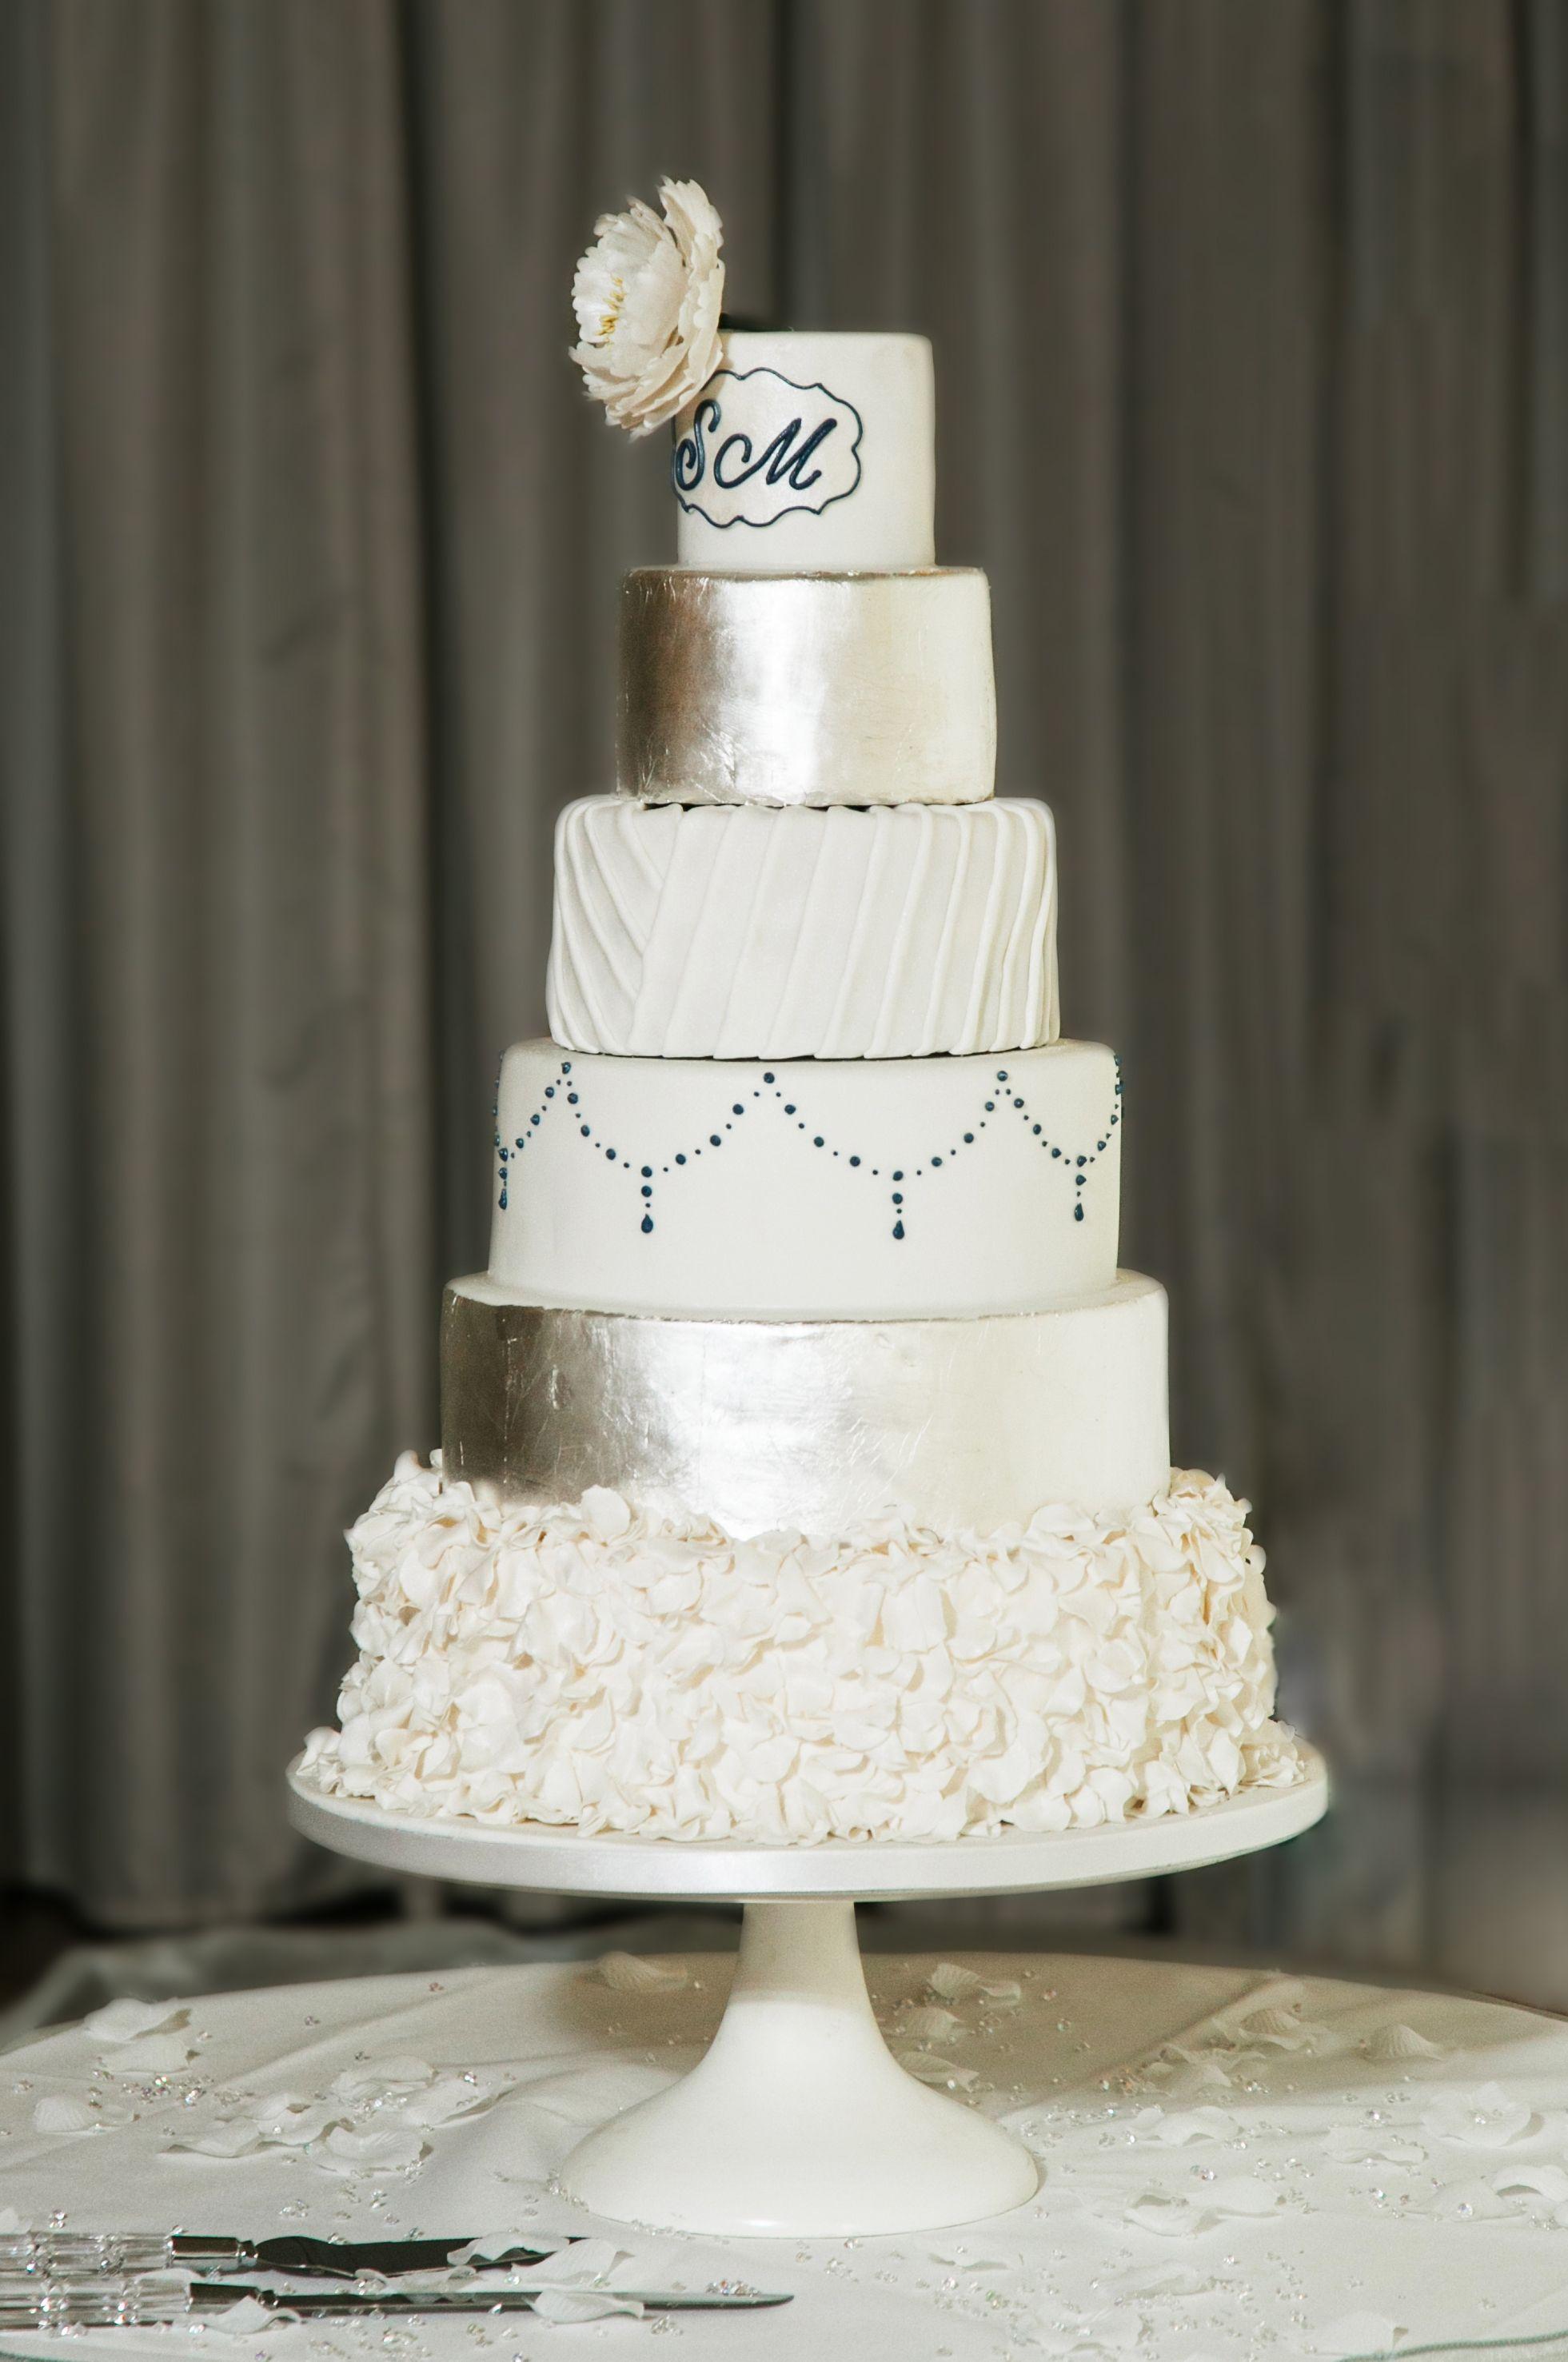 6 Tier Silver Leaf Ruffle Monogram White Navy Blue Wedding Cake